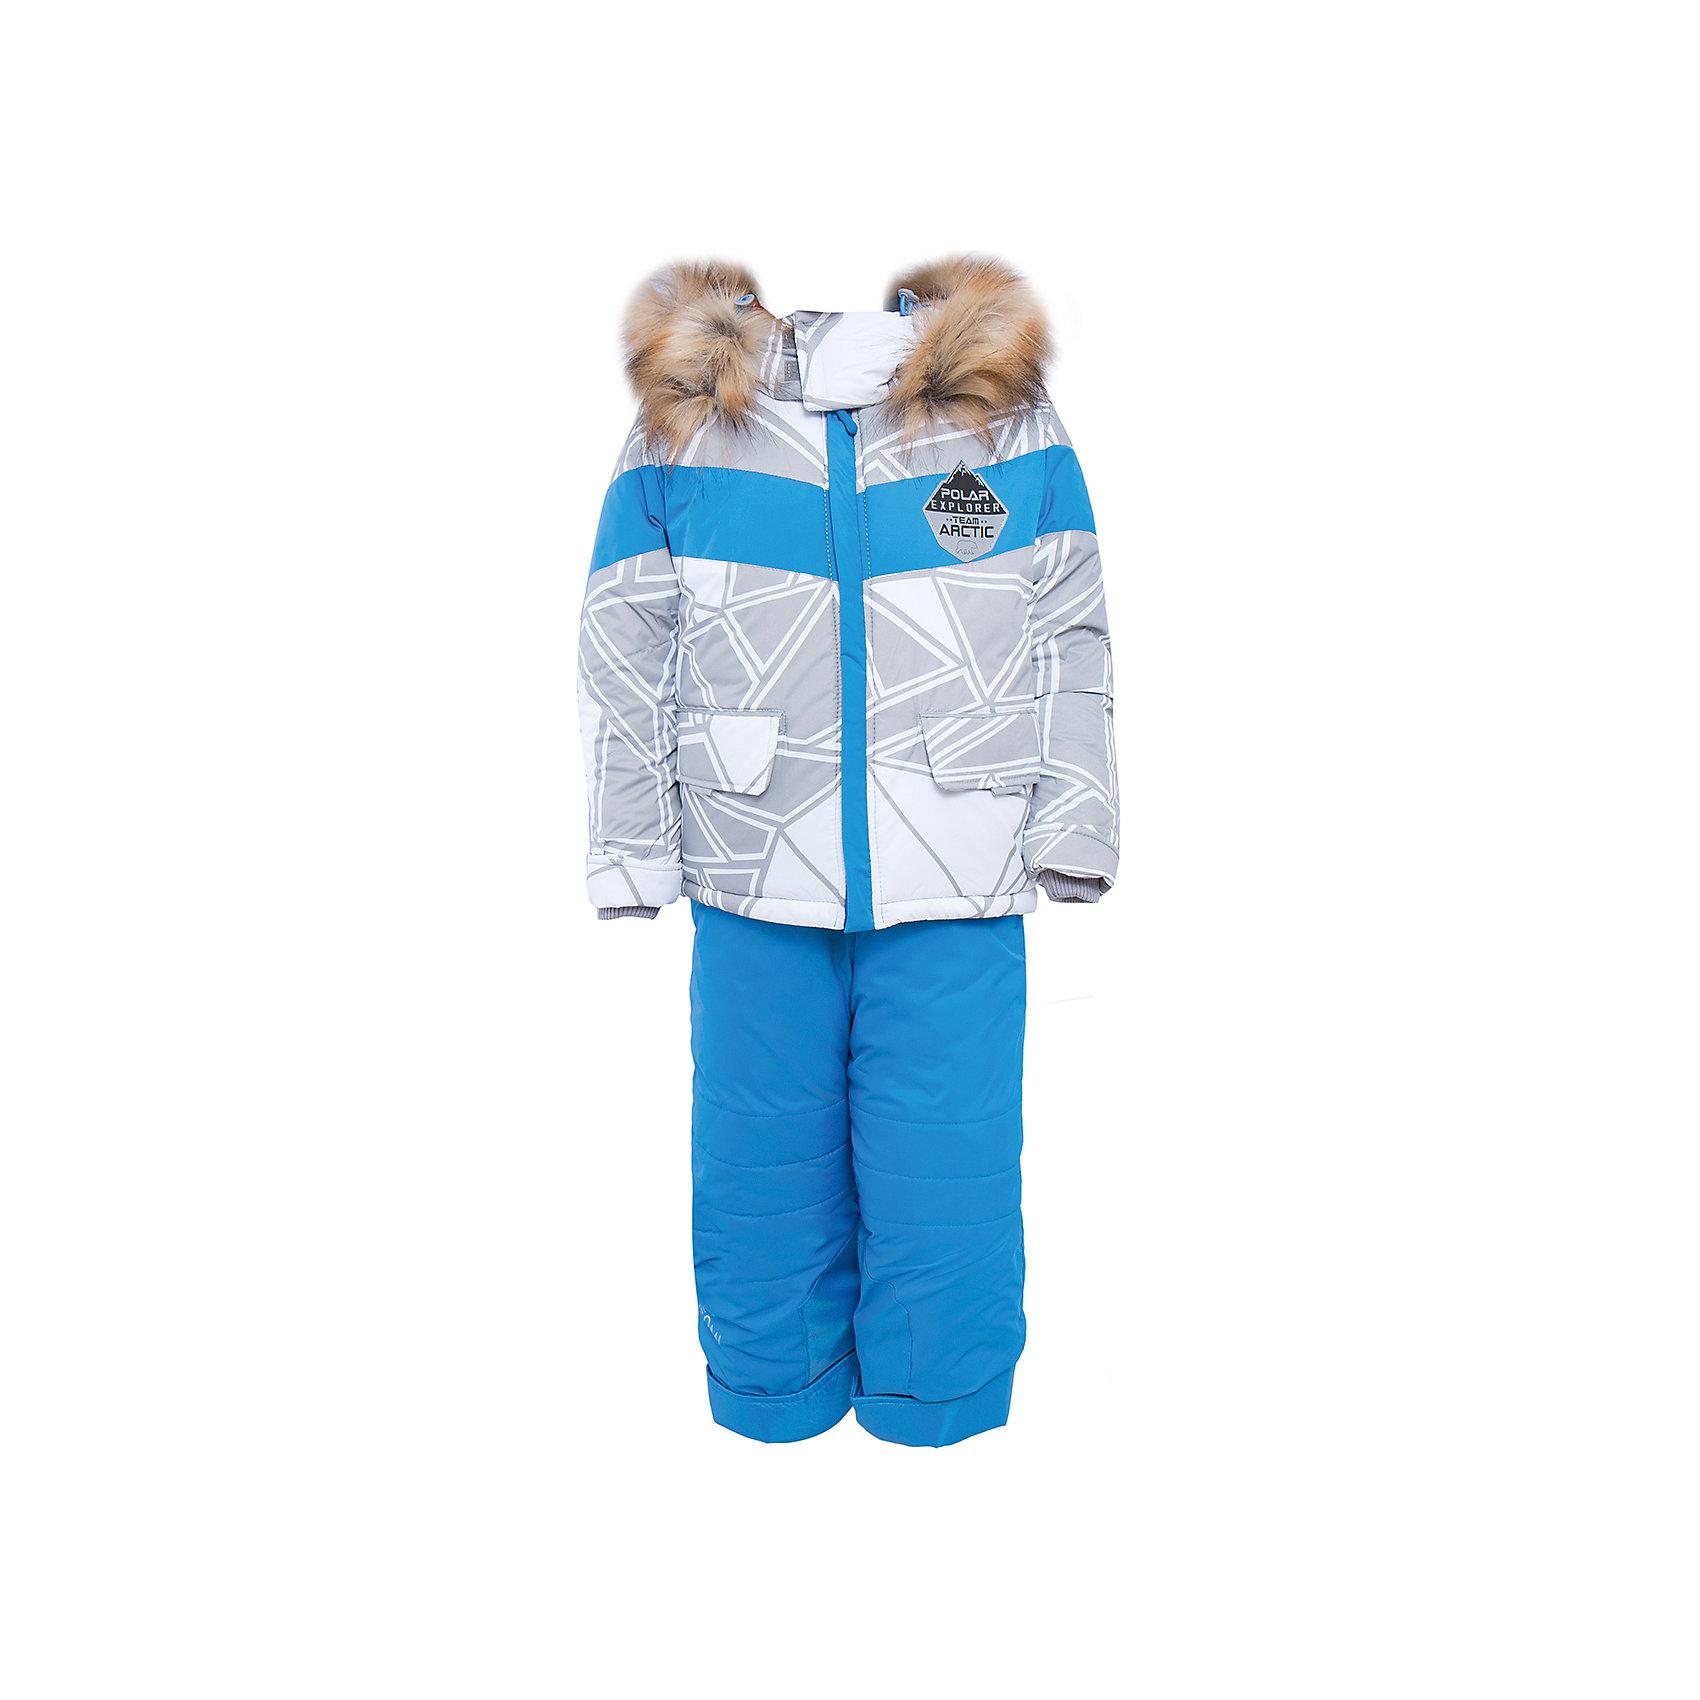 BOOM by Orby Комплект: курта и брюки для мальчика BOOM by Orby женское нижнее белье